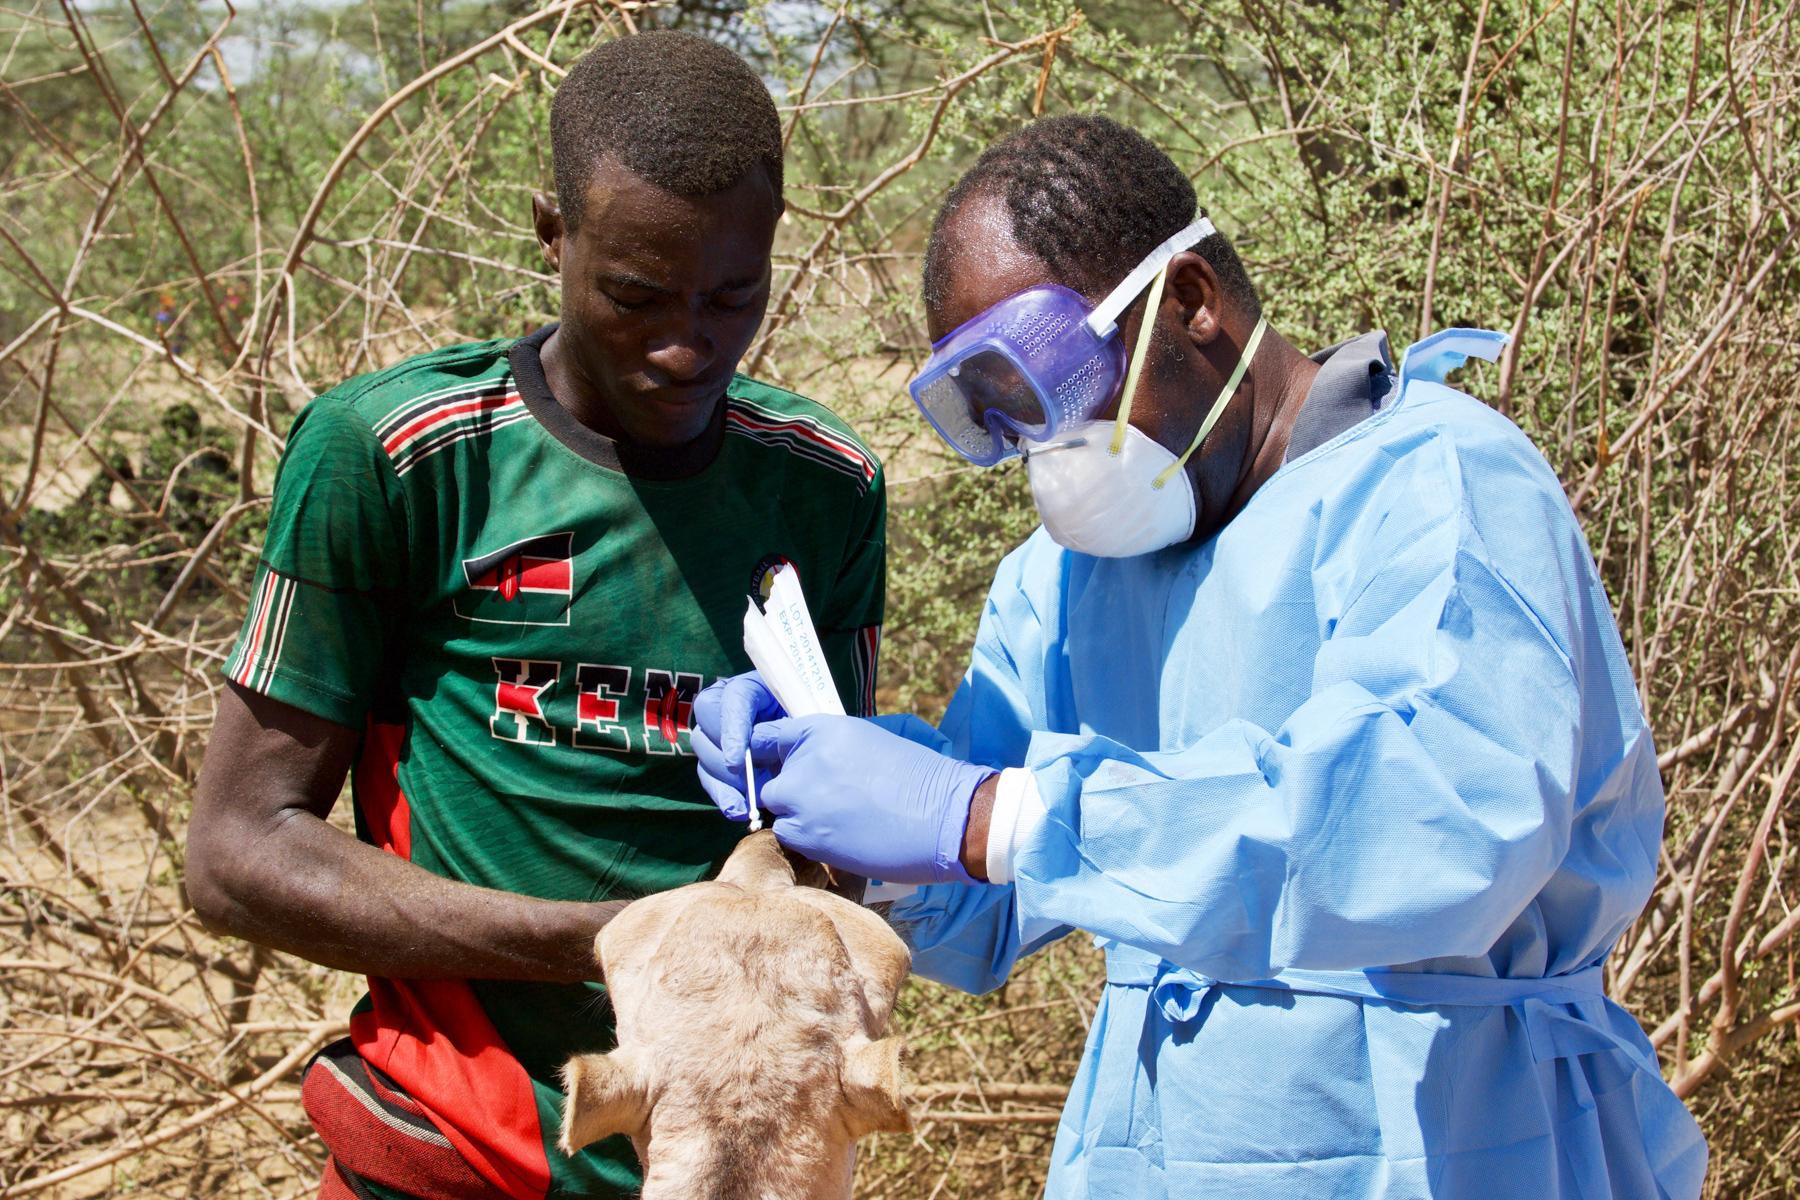 Two men taking samples from a camel's nose (PREDICT/Kenya)